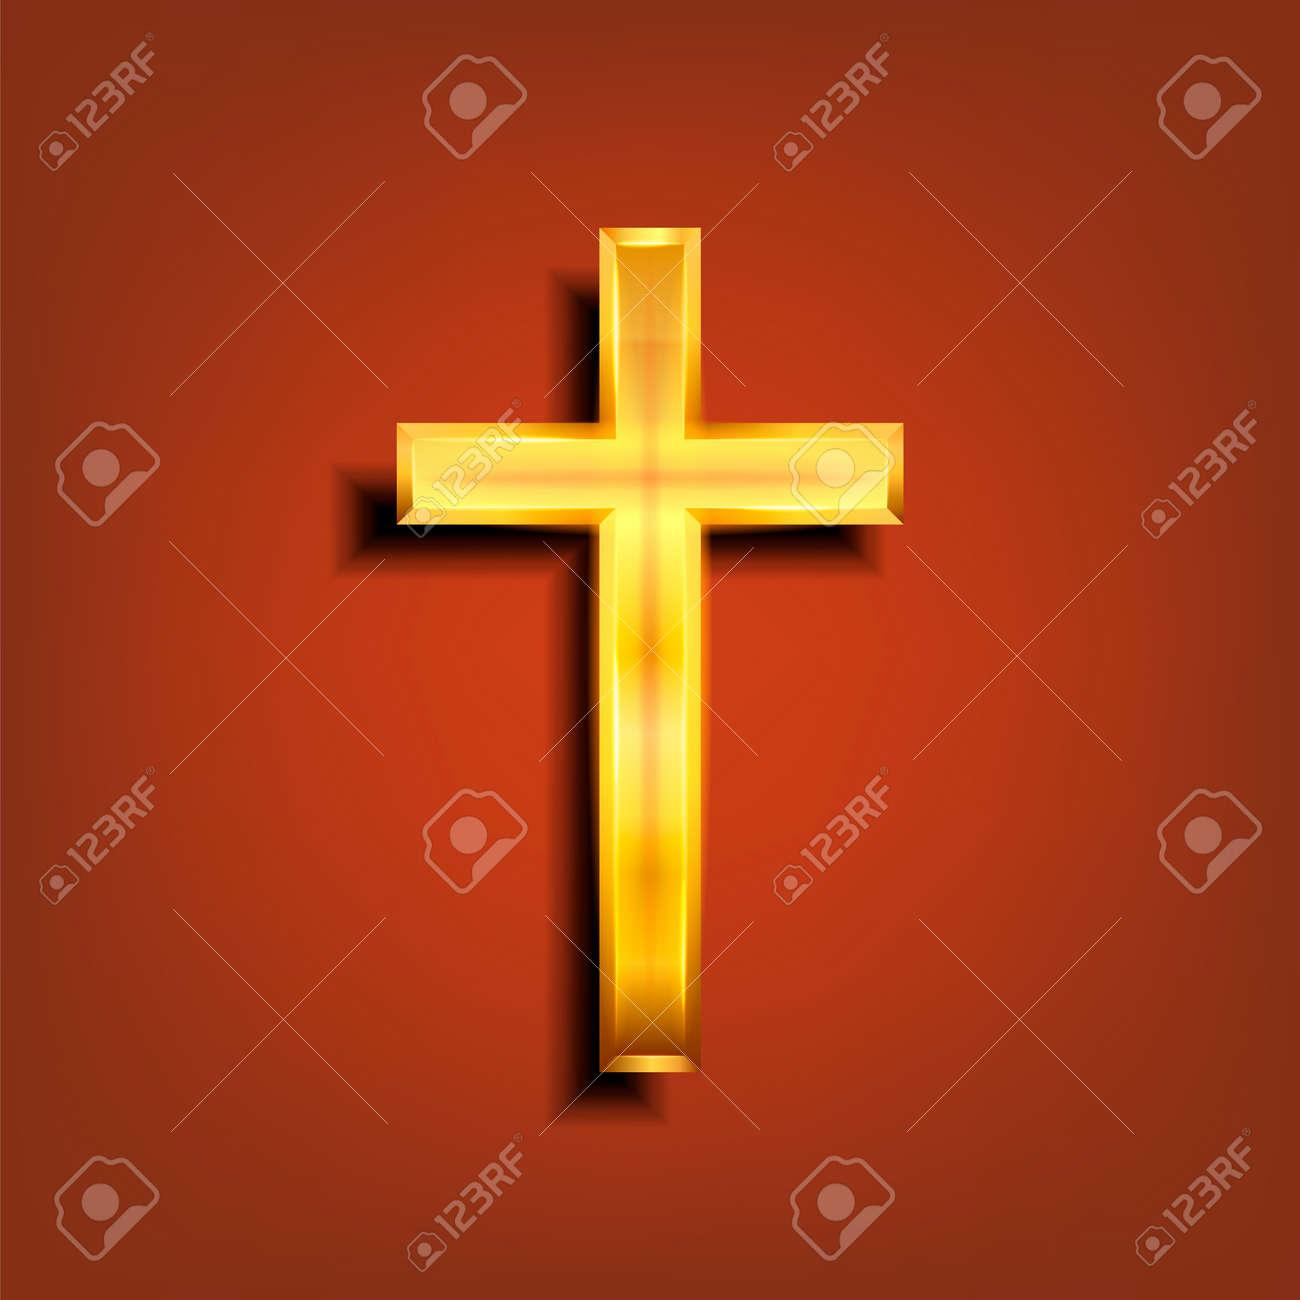 Golden Christian cross. Realistic cross isolated on background. Vector illustration. - 164872022